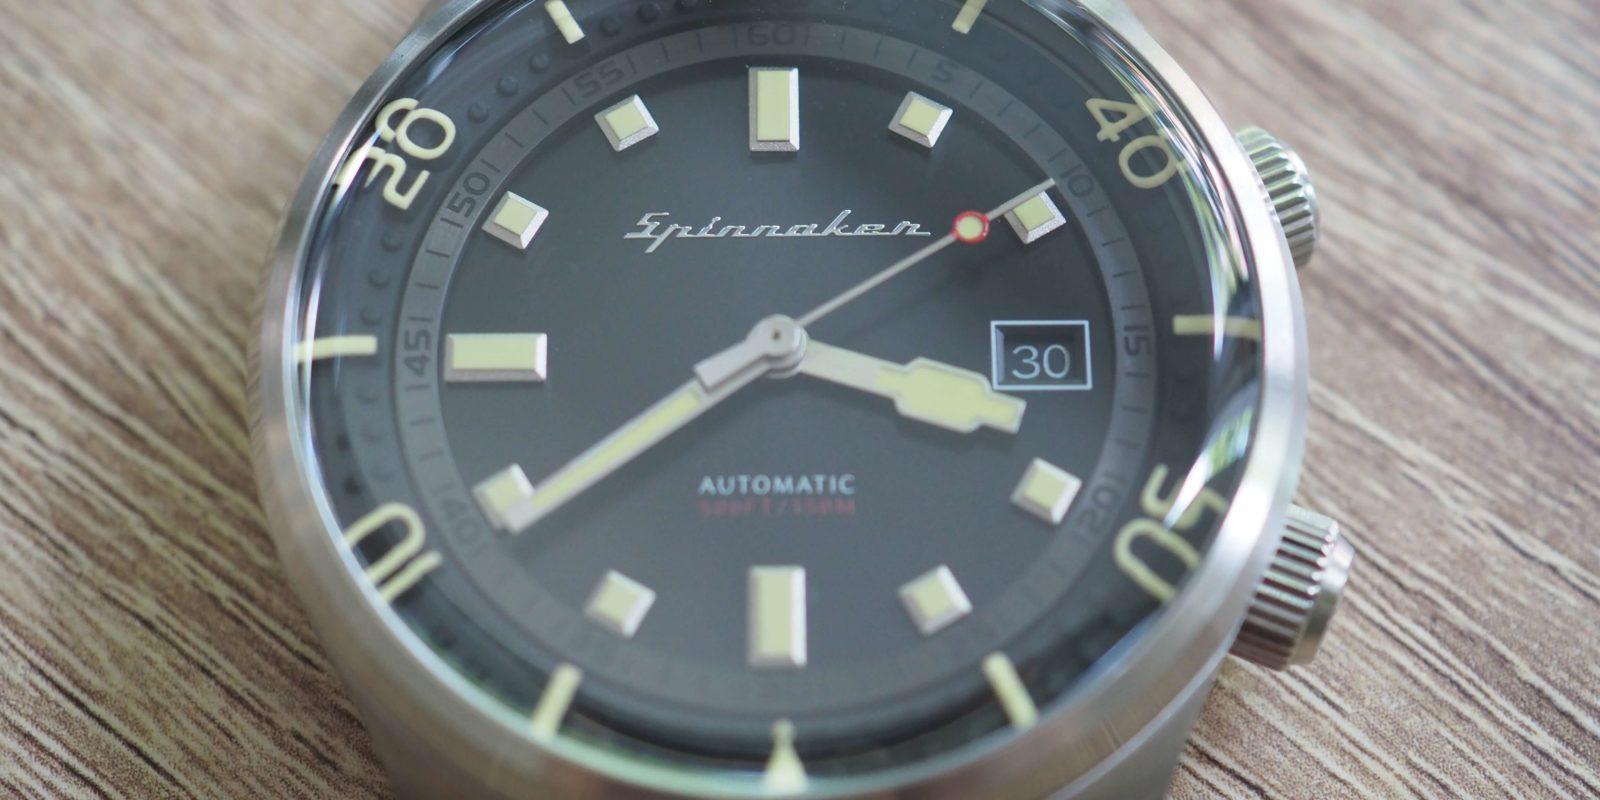 Spinnaker Bradner SP-5057-01 Watch Review